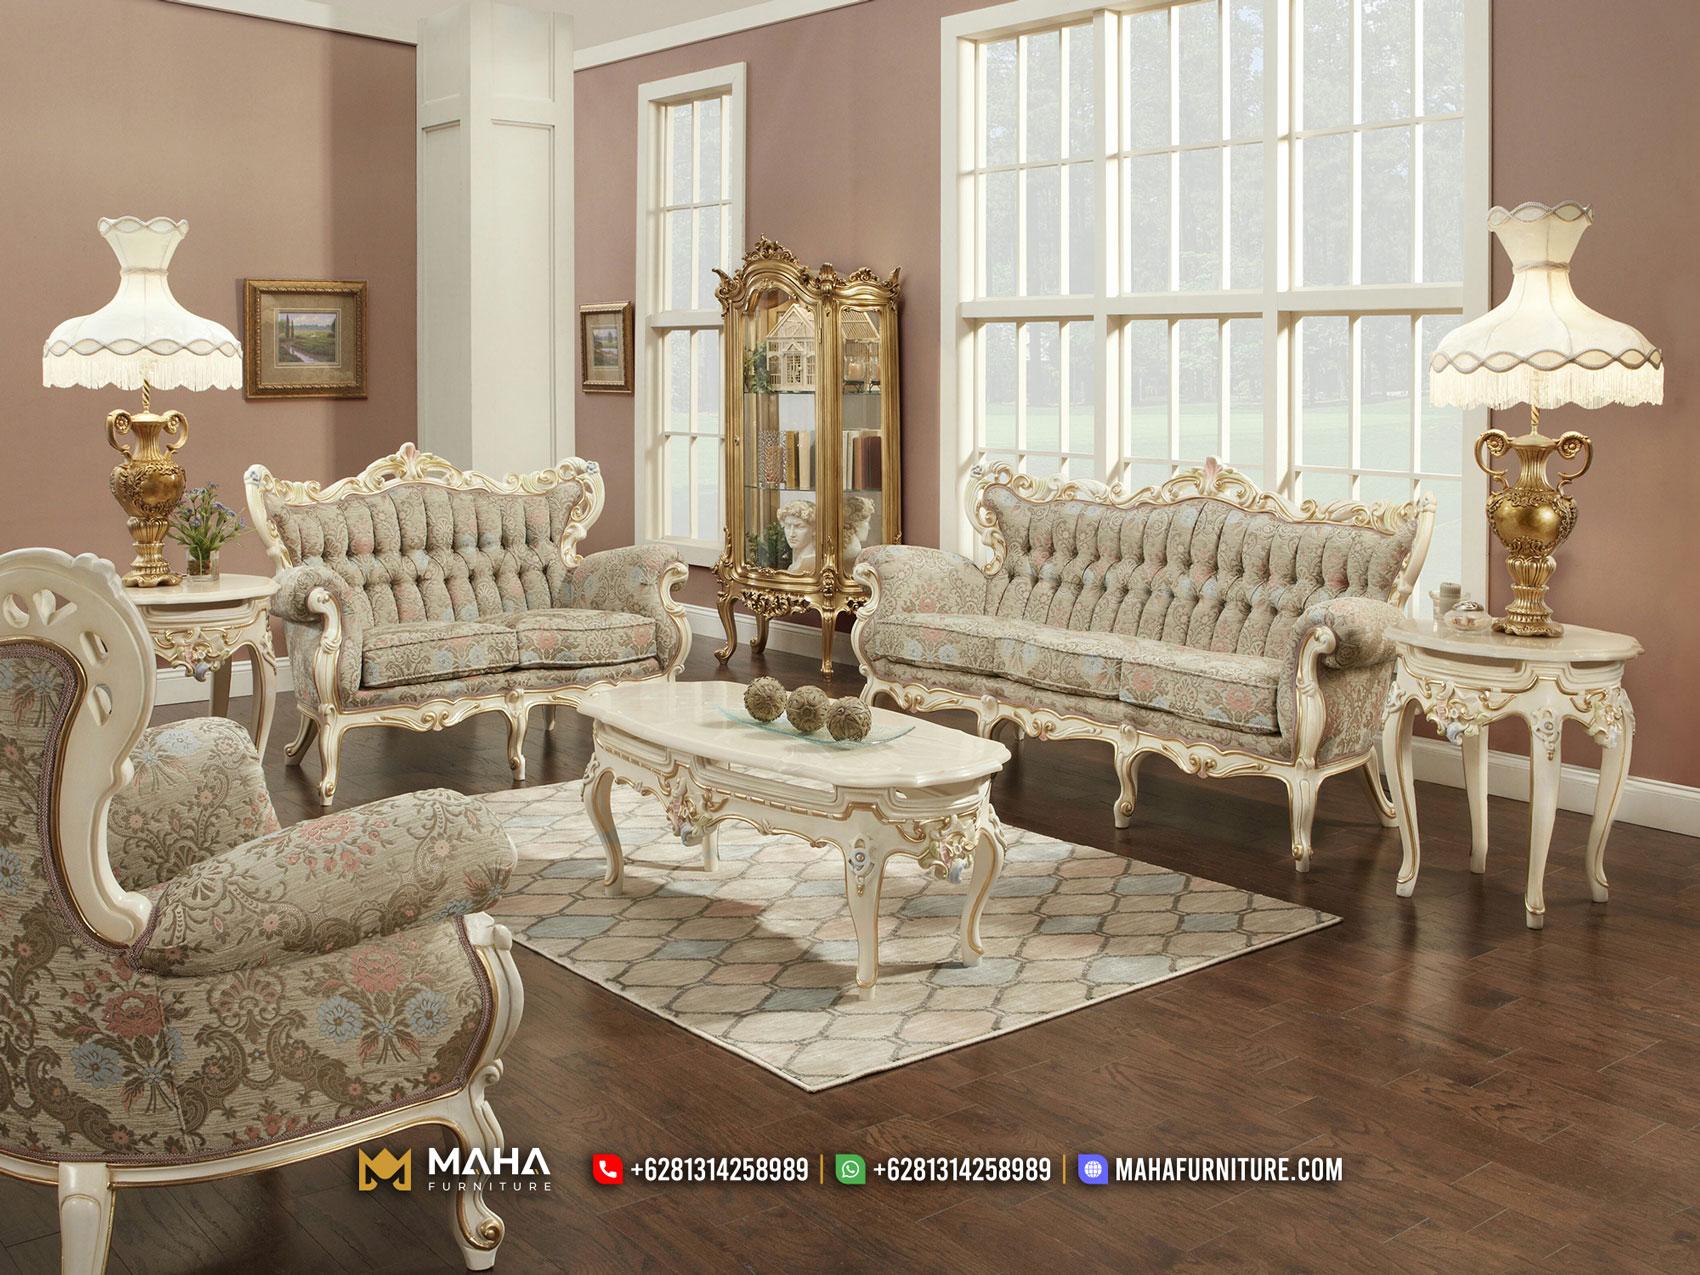 Sofa Ruang Tamu Ukir Mewah Jepara Glamorous Golden MF74